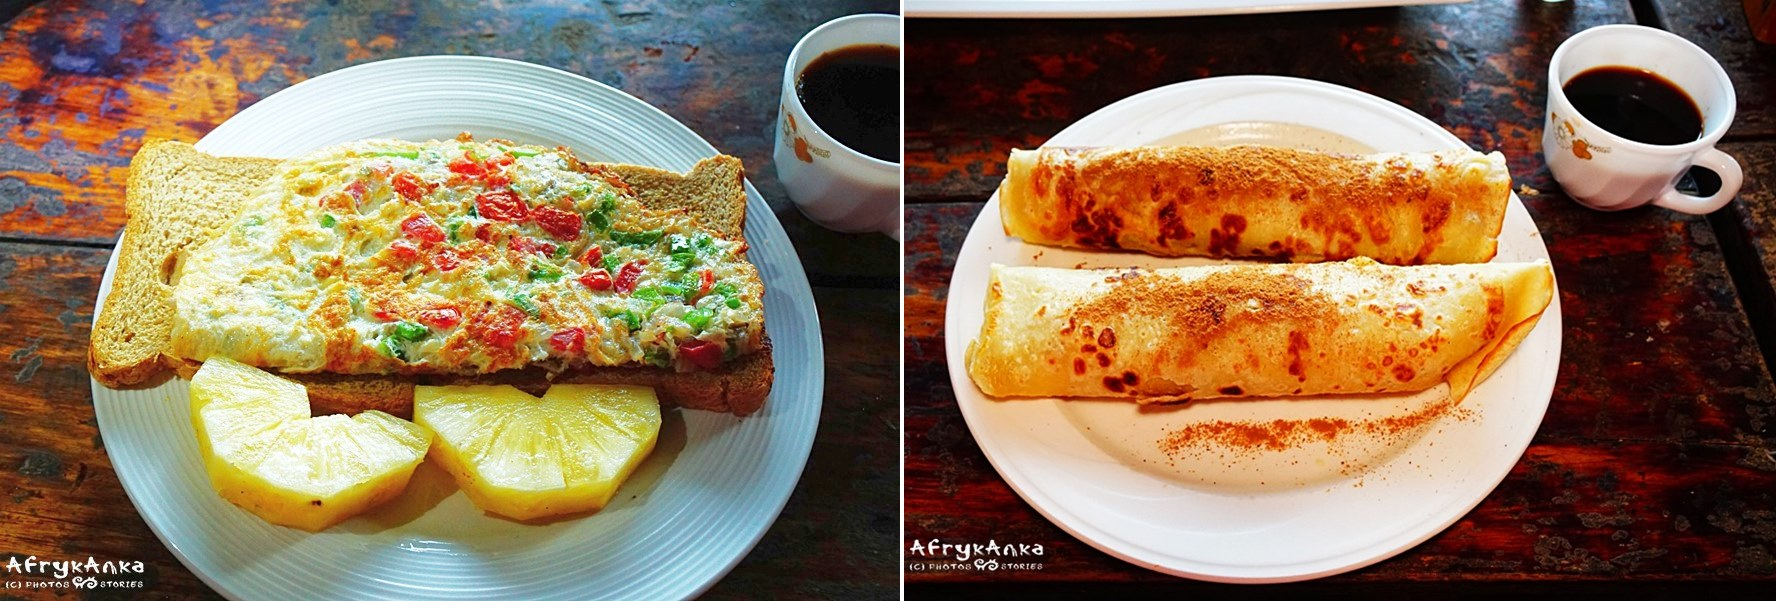 Śniadanie: tosty i omlet lub naleśniki.